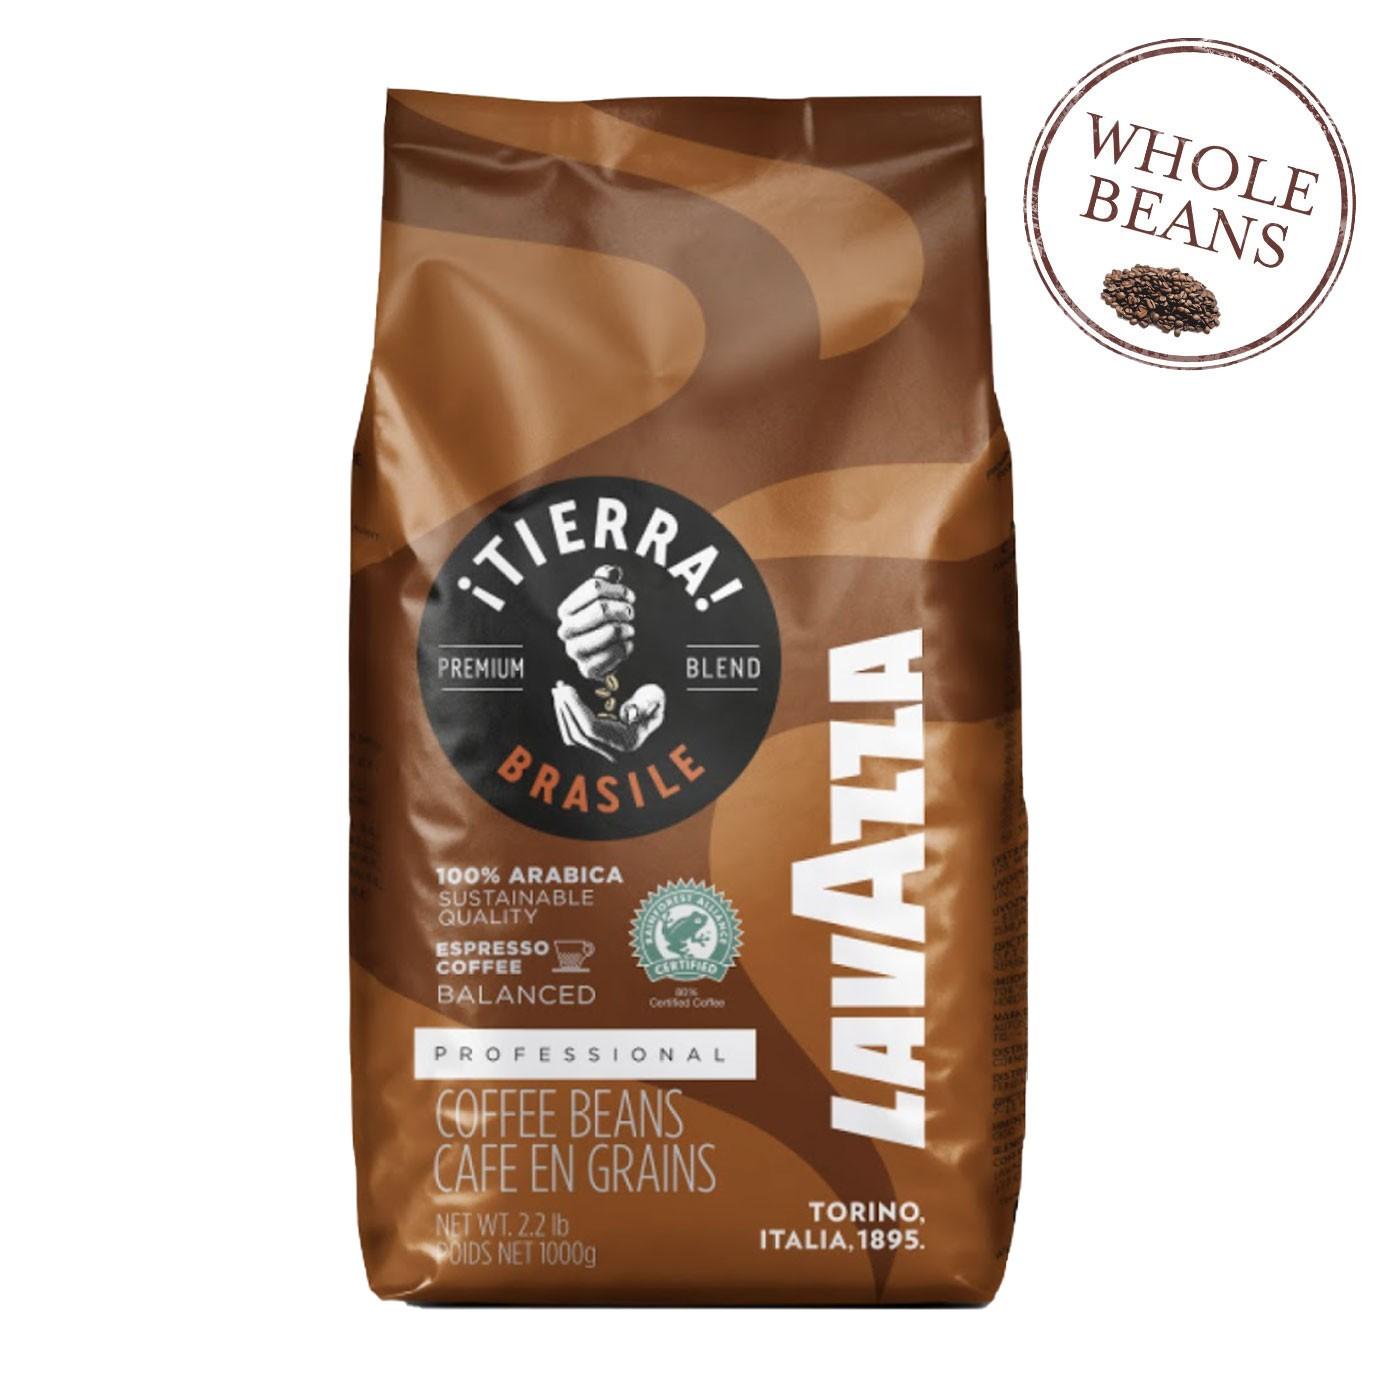 Tierra Brazil 100% Arabica Whole Beans 35.2 oz